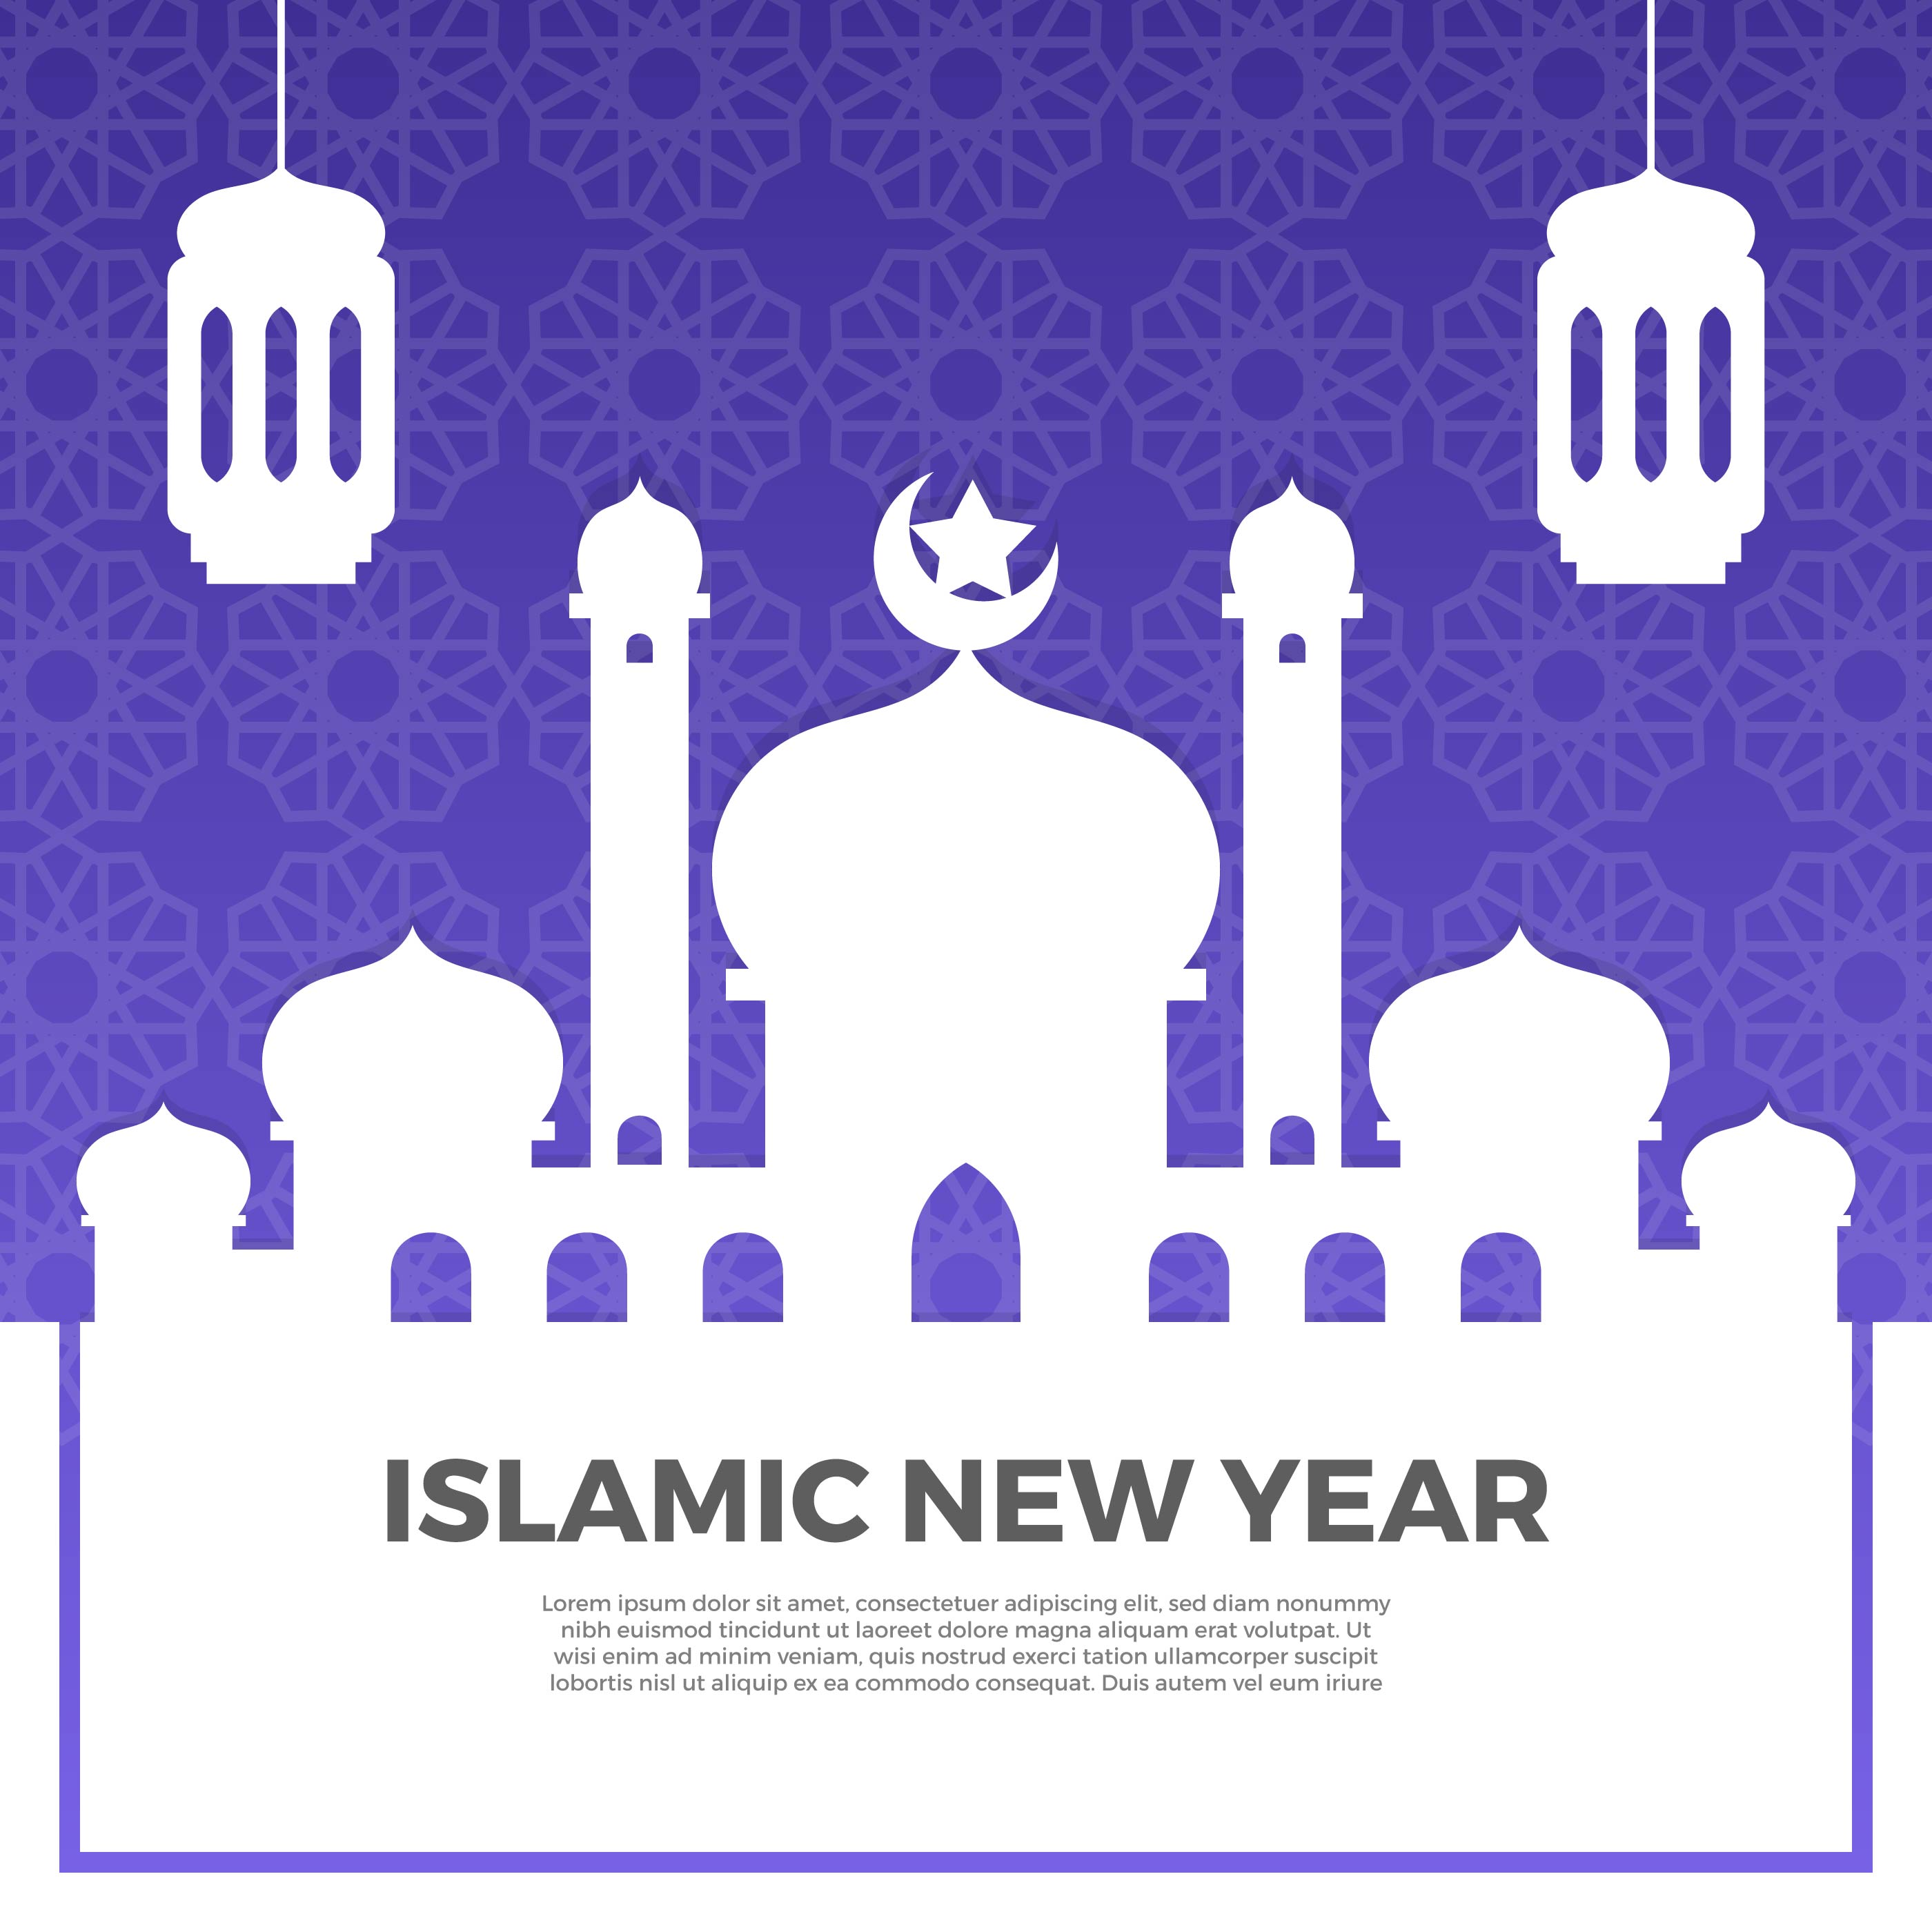 Minimalist Islamic New Year Greetings With Gradient Pattern